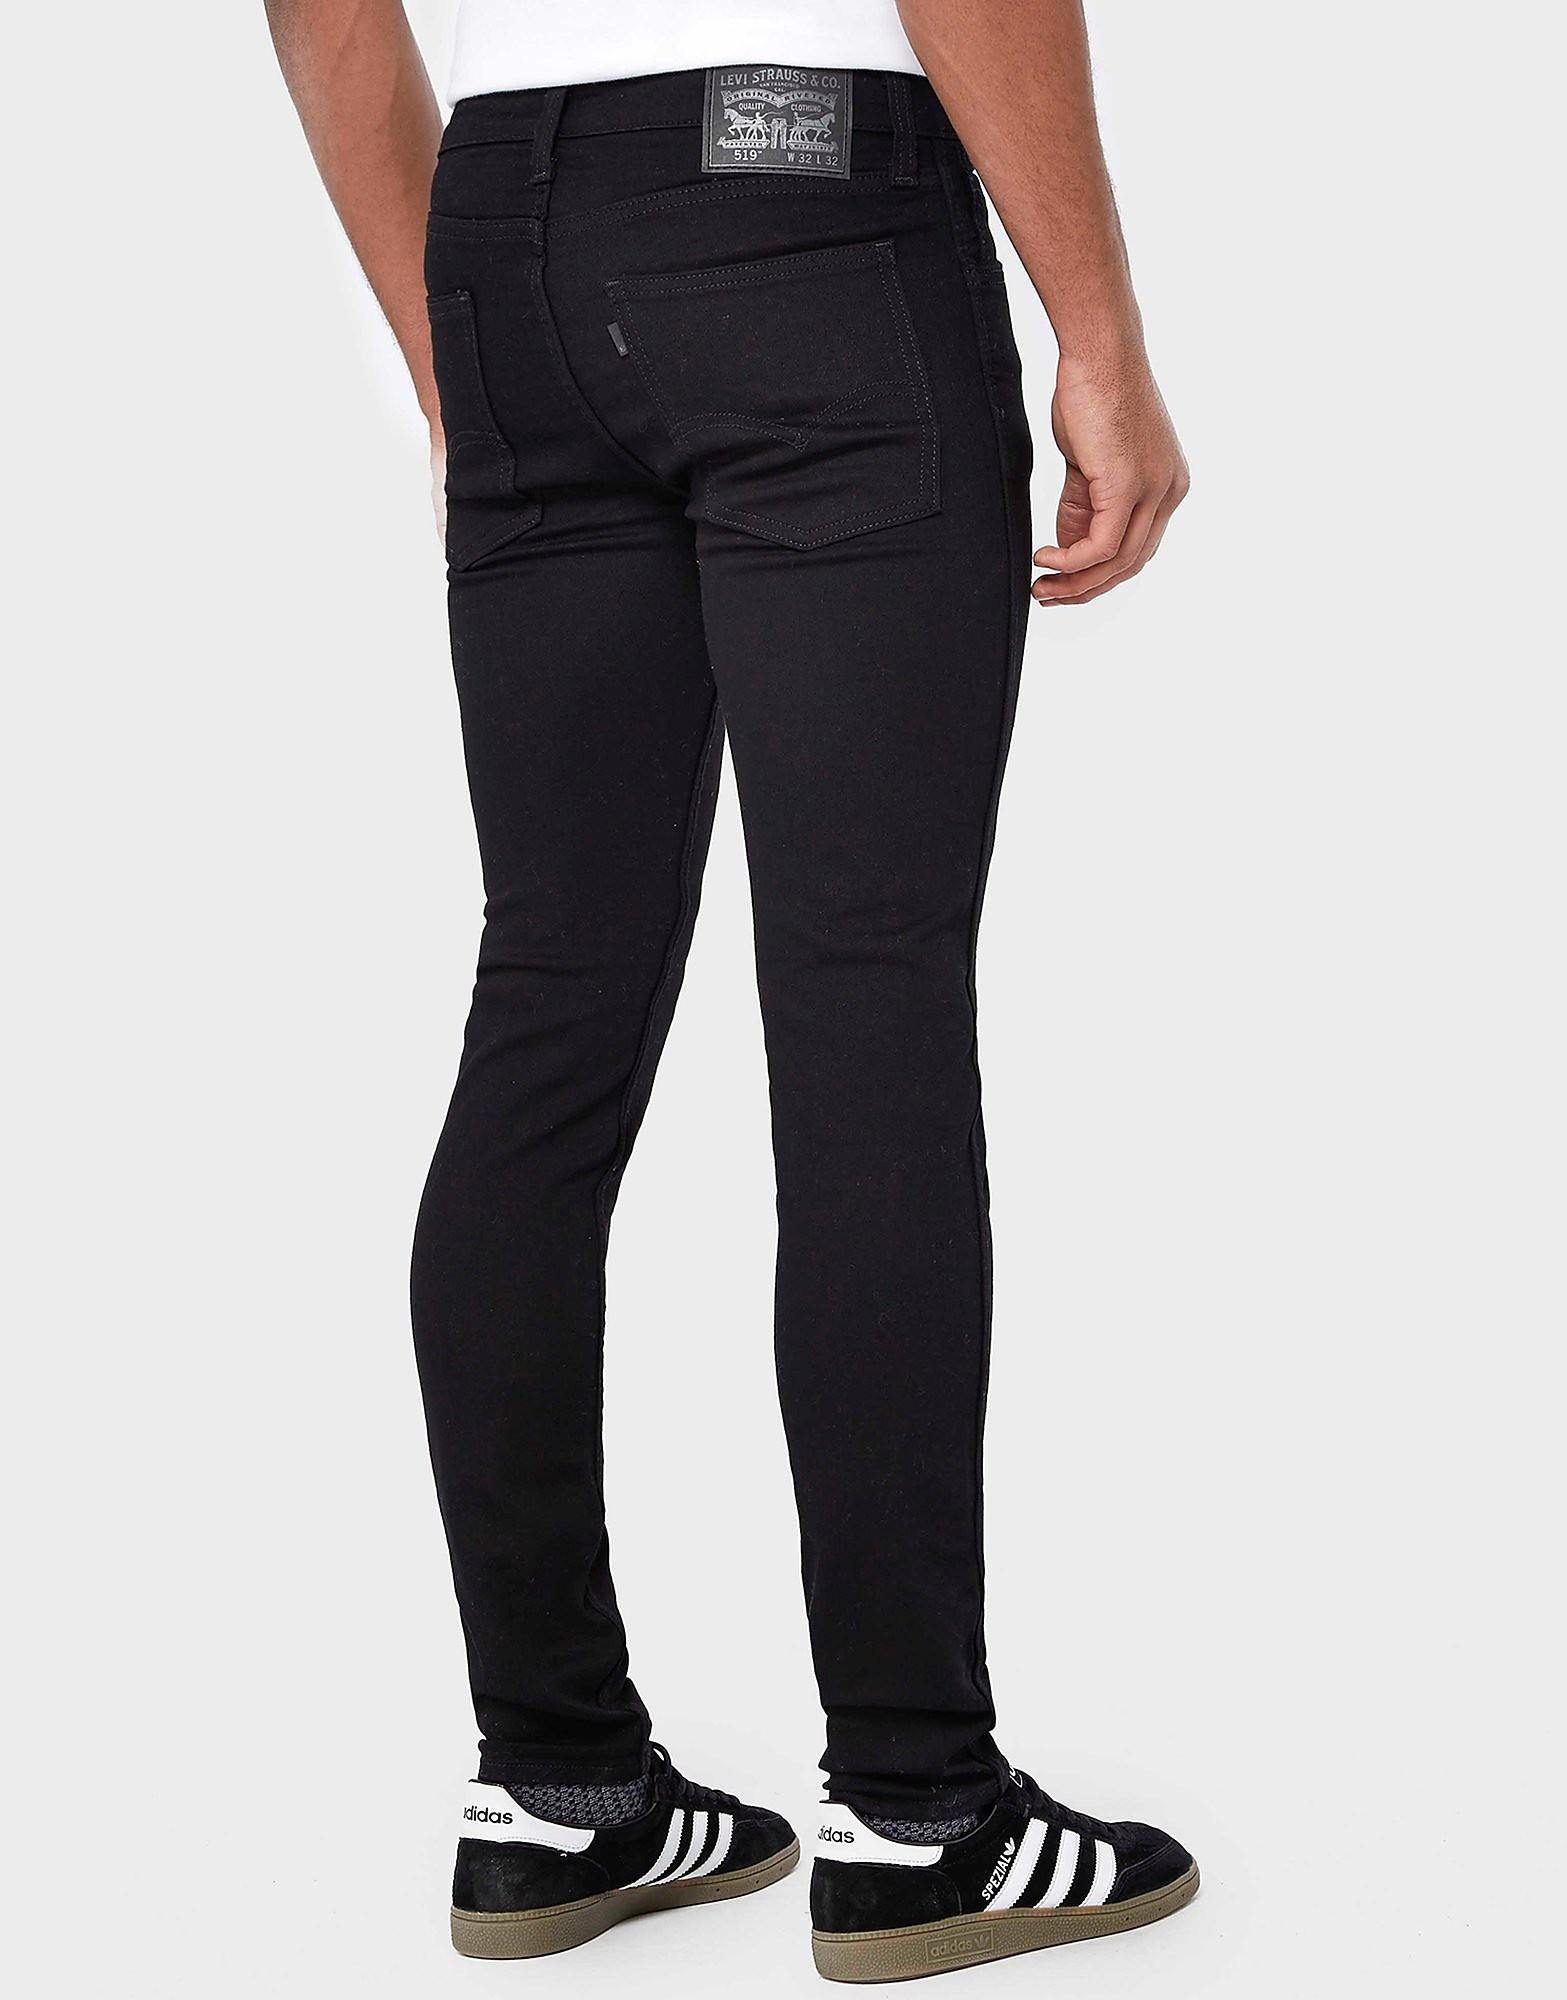 Levis 519 Skinny Jeans